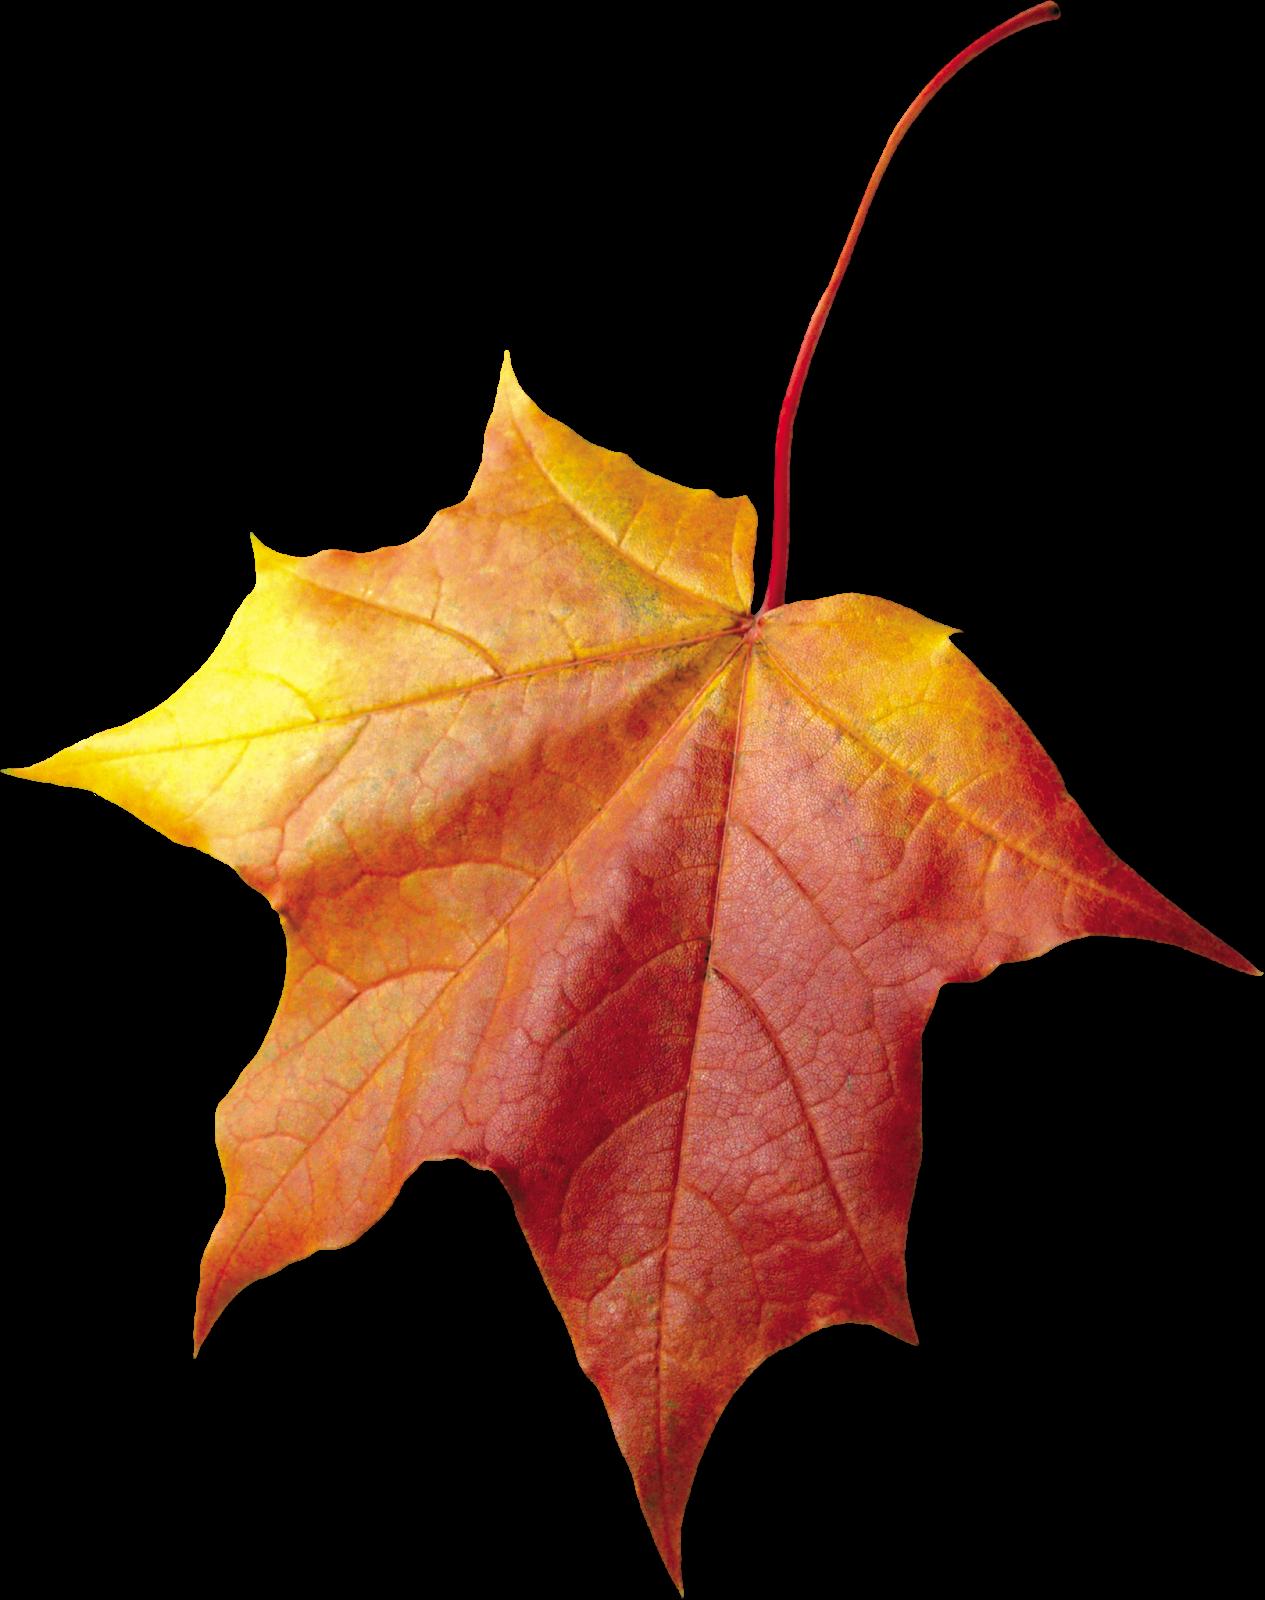 Free download of осенние листья фон Vector Graphic  Vectorme